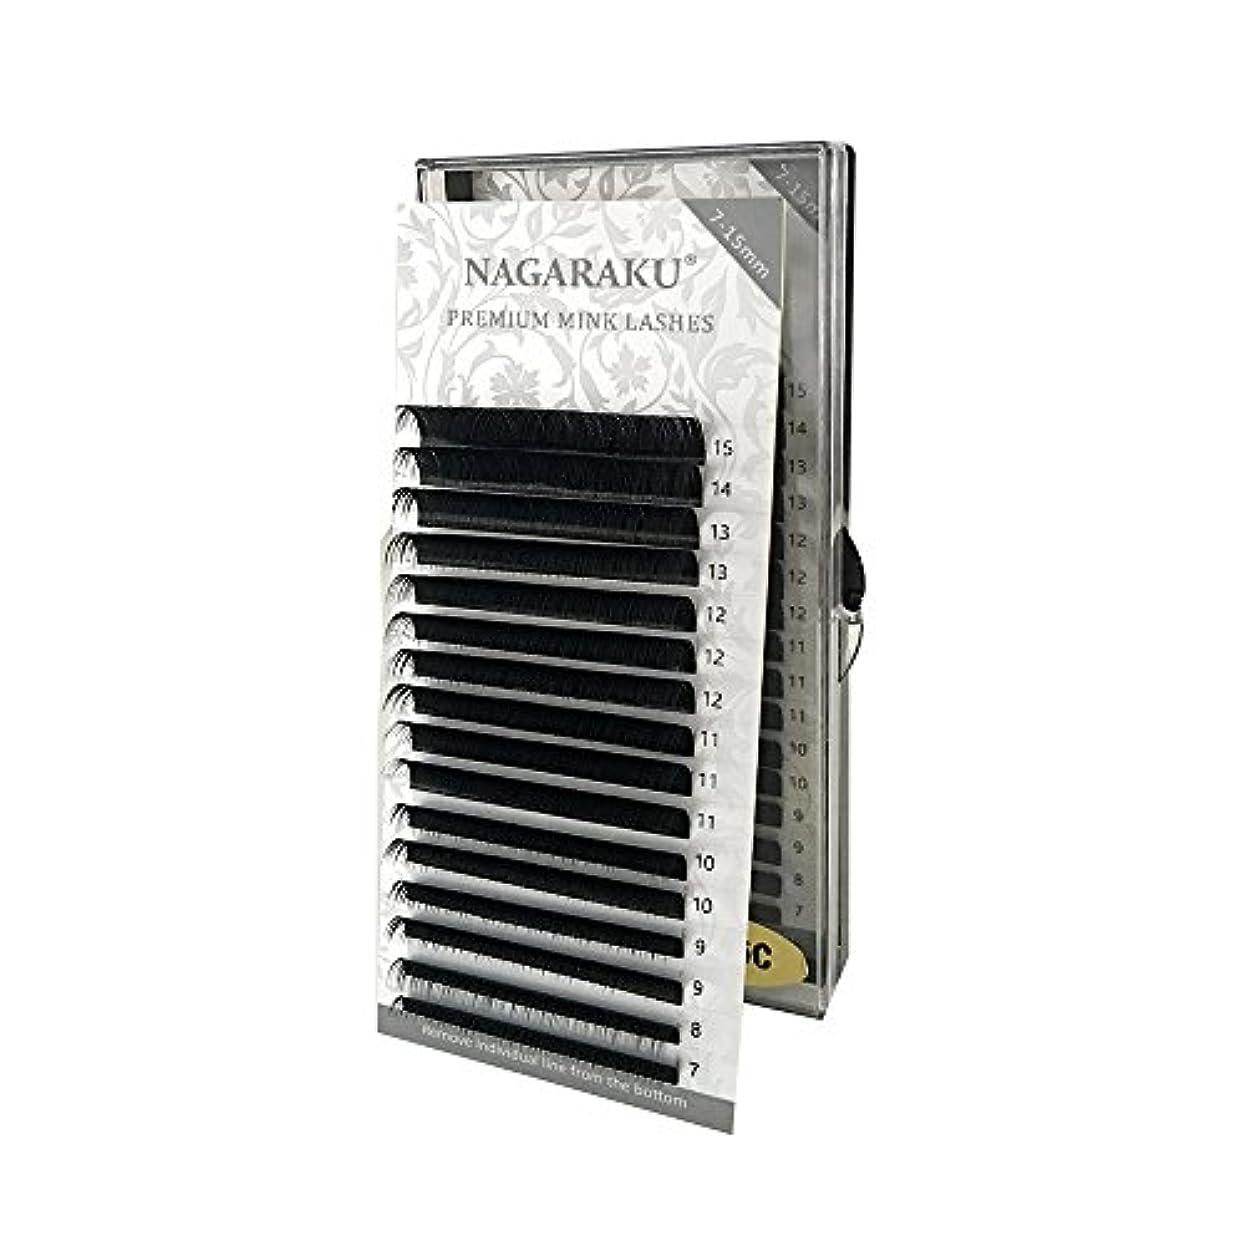 NAGARAKU 太さ0.12mm J カール 7~15mmミックス まつ毛エクステンション